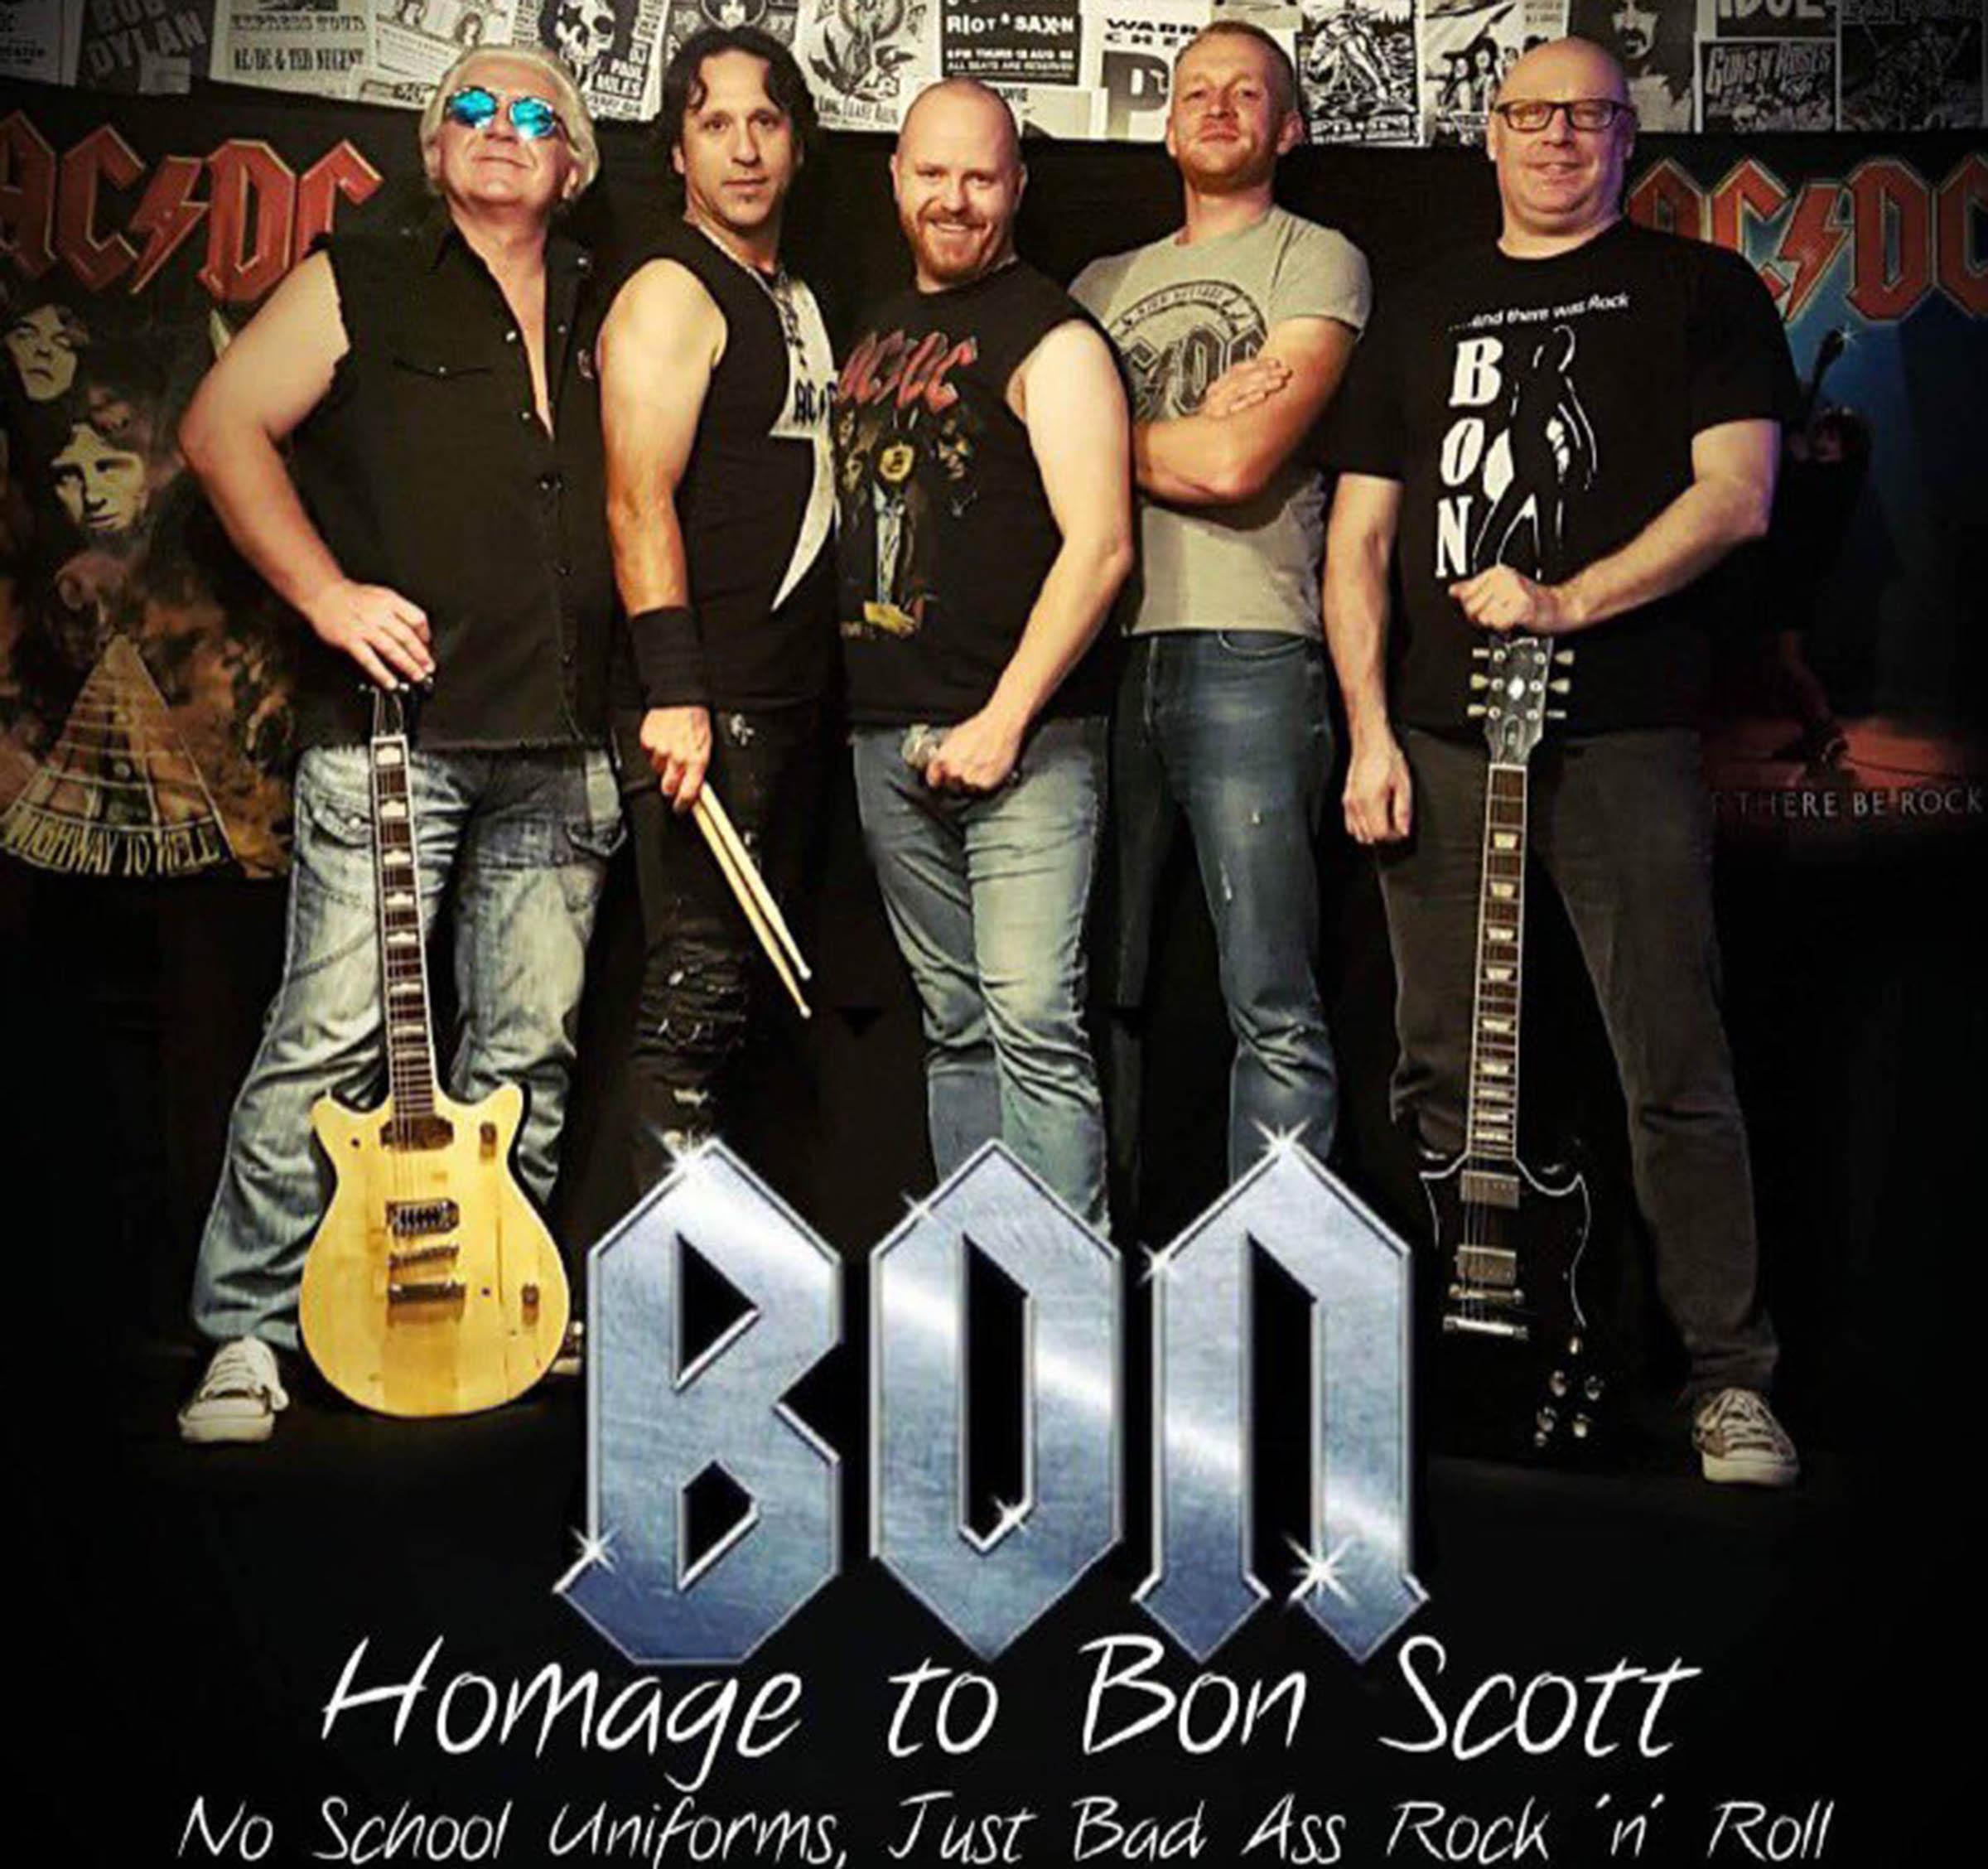 Scuderi as part of the Bon Scott tribute band